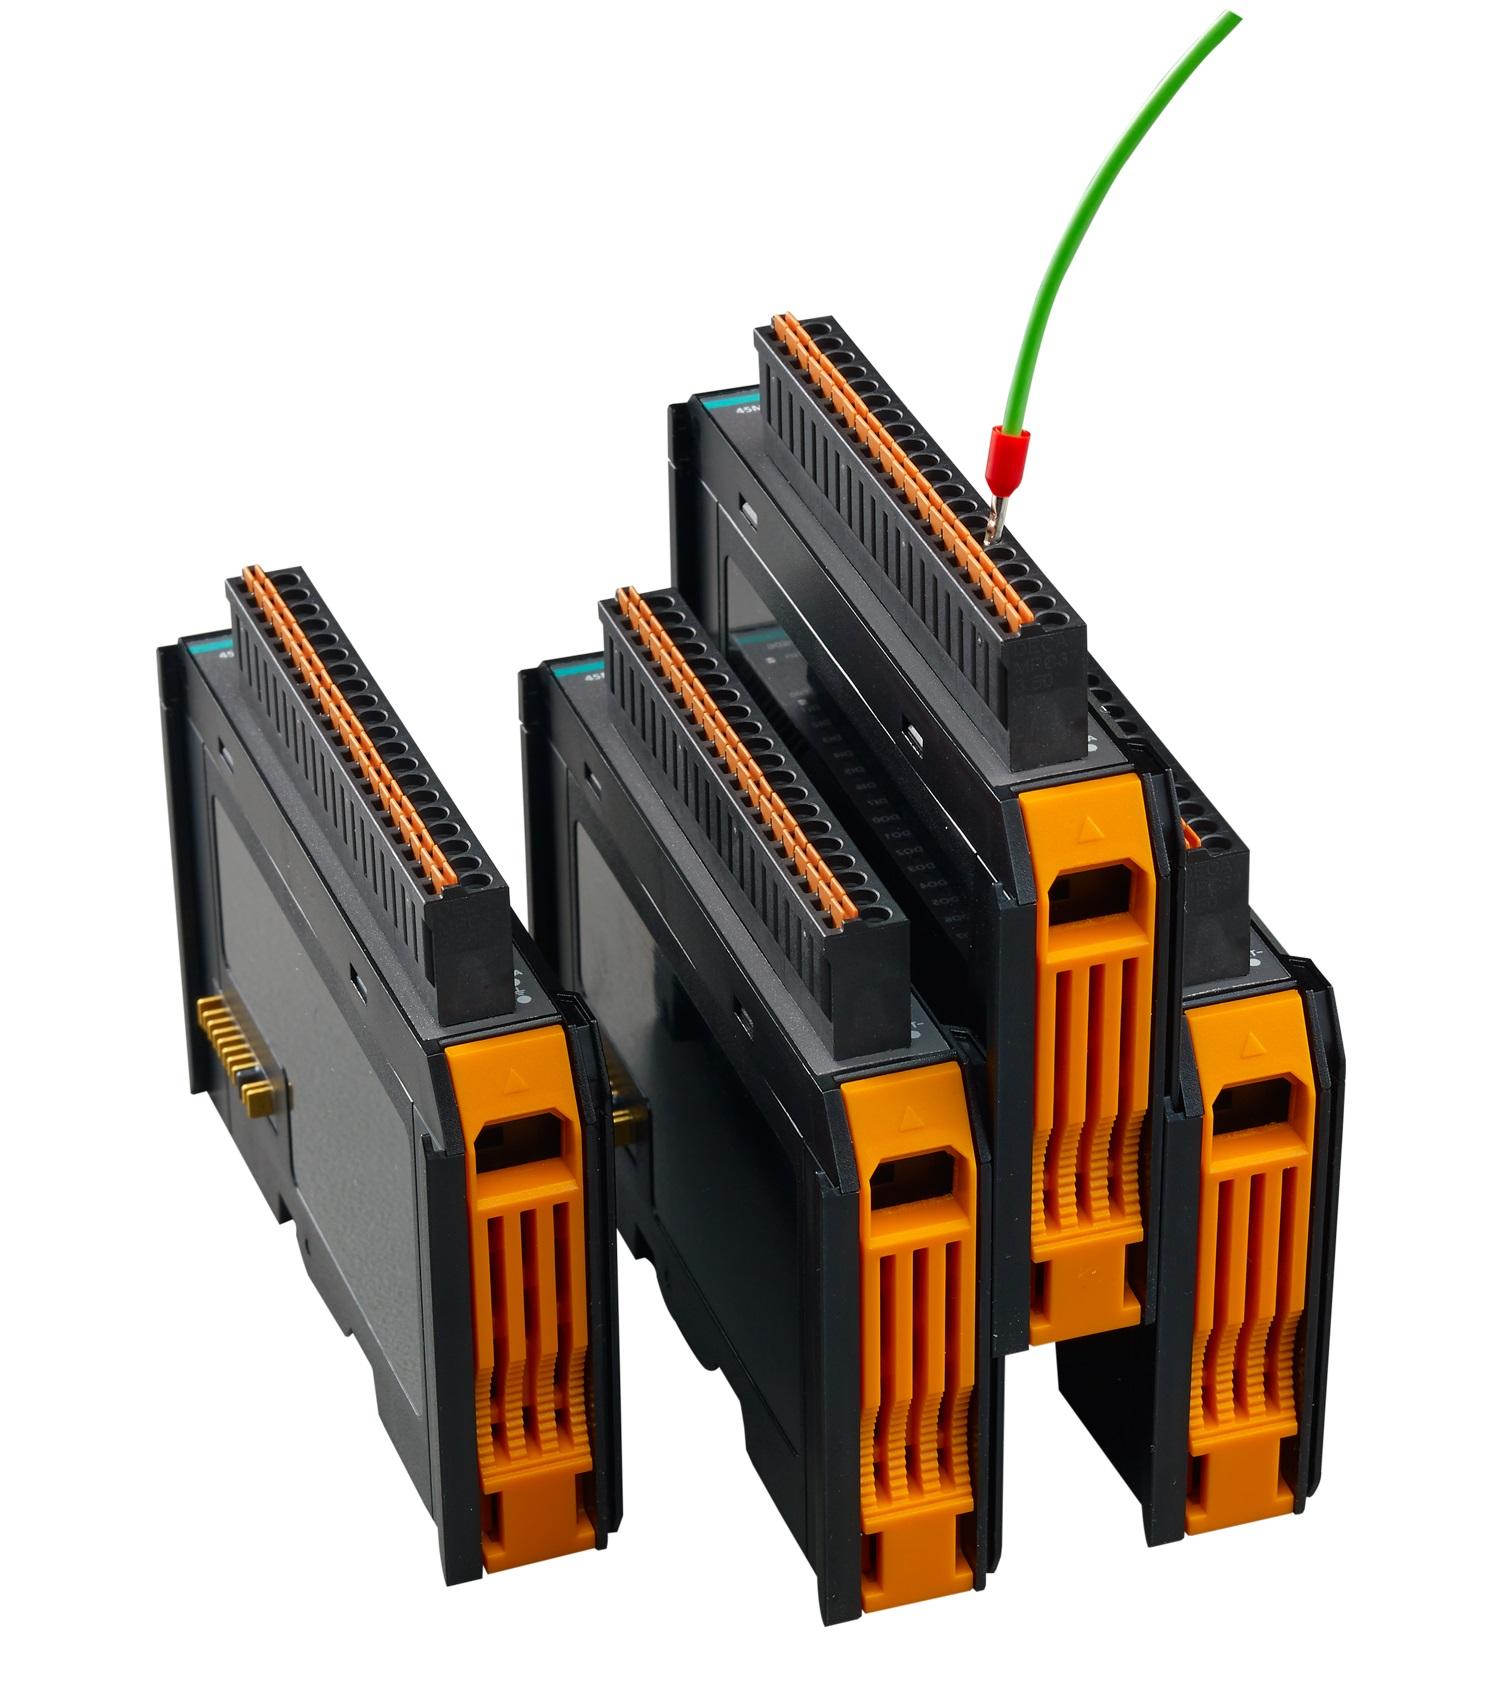 45MR-3800: Модуль для ioThinx 4500 с 8 каналами 8 AI (0-20 мА/4-20 мА), питанием 24 В пост., диапазоном рабочих температур от -20 до 60°C, Moxa